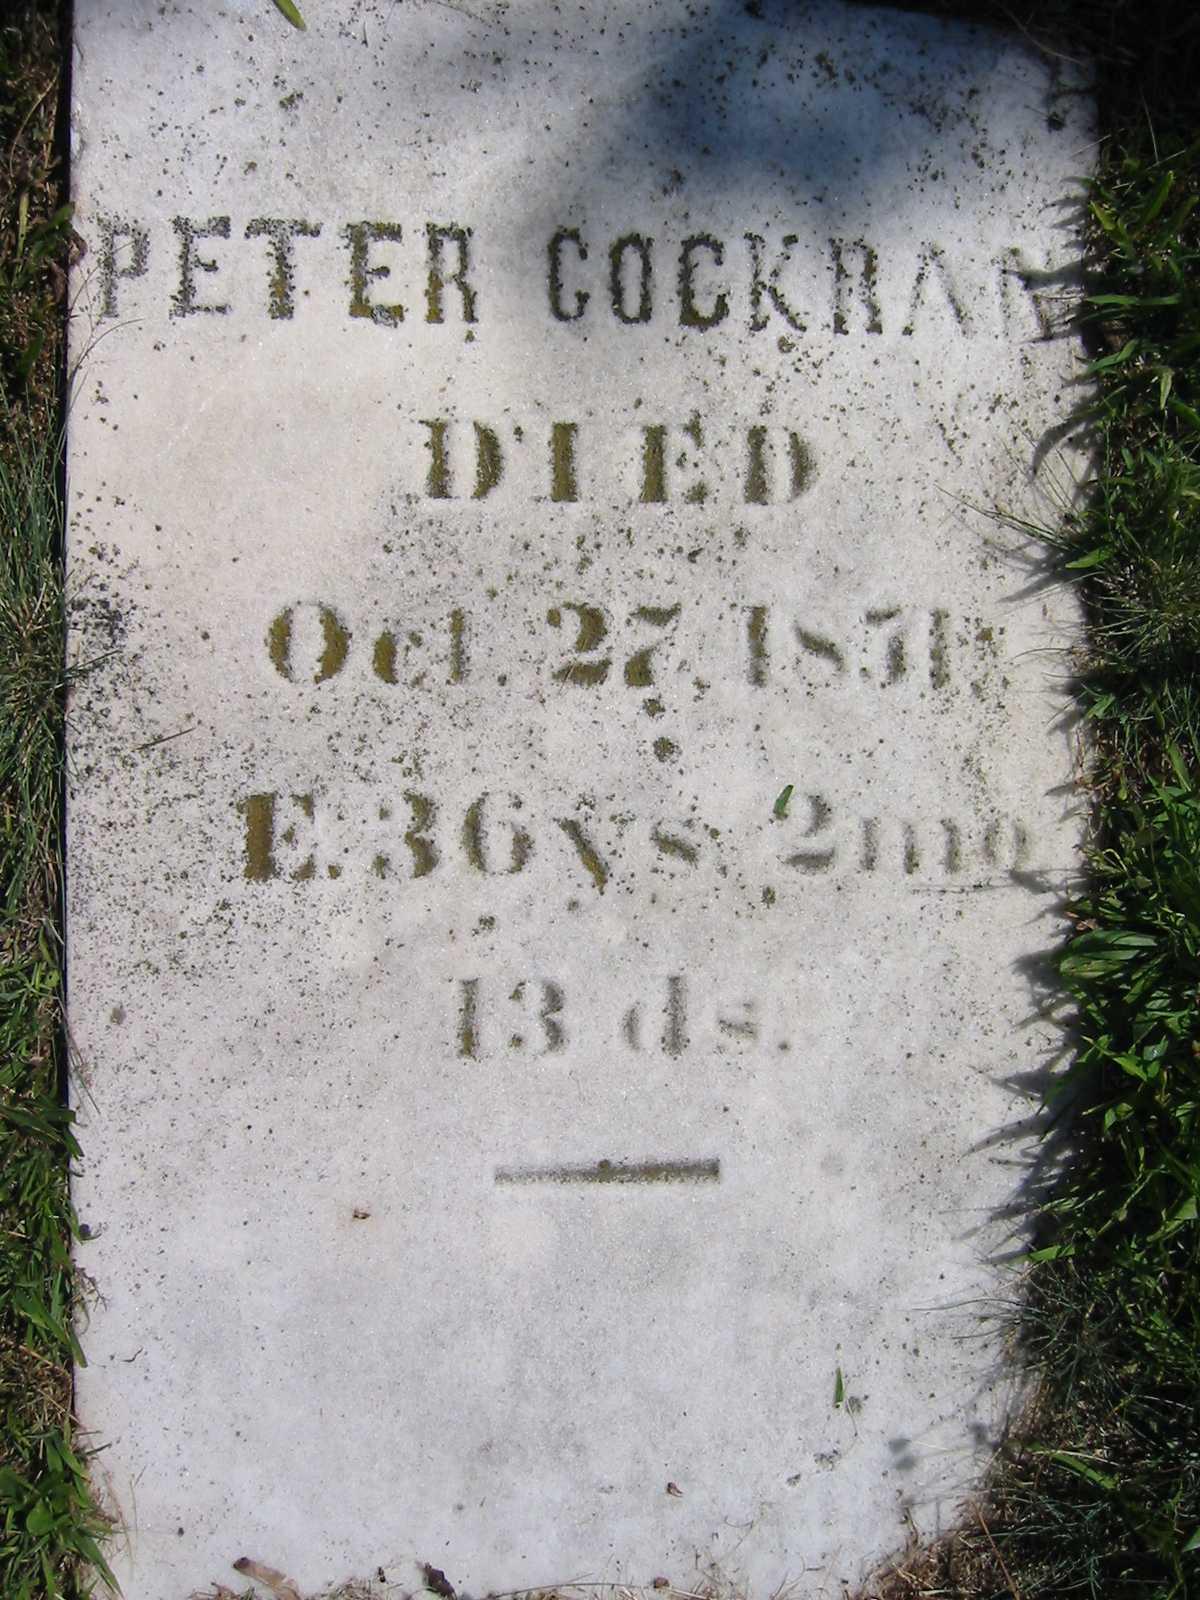 Peter Cockran